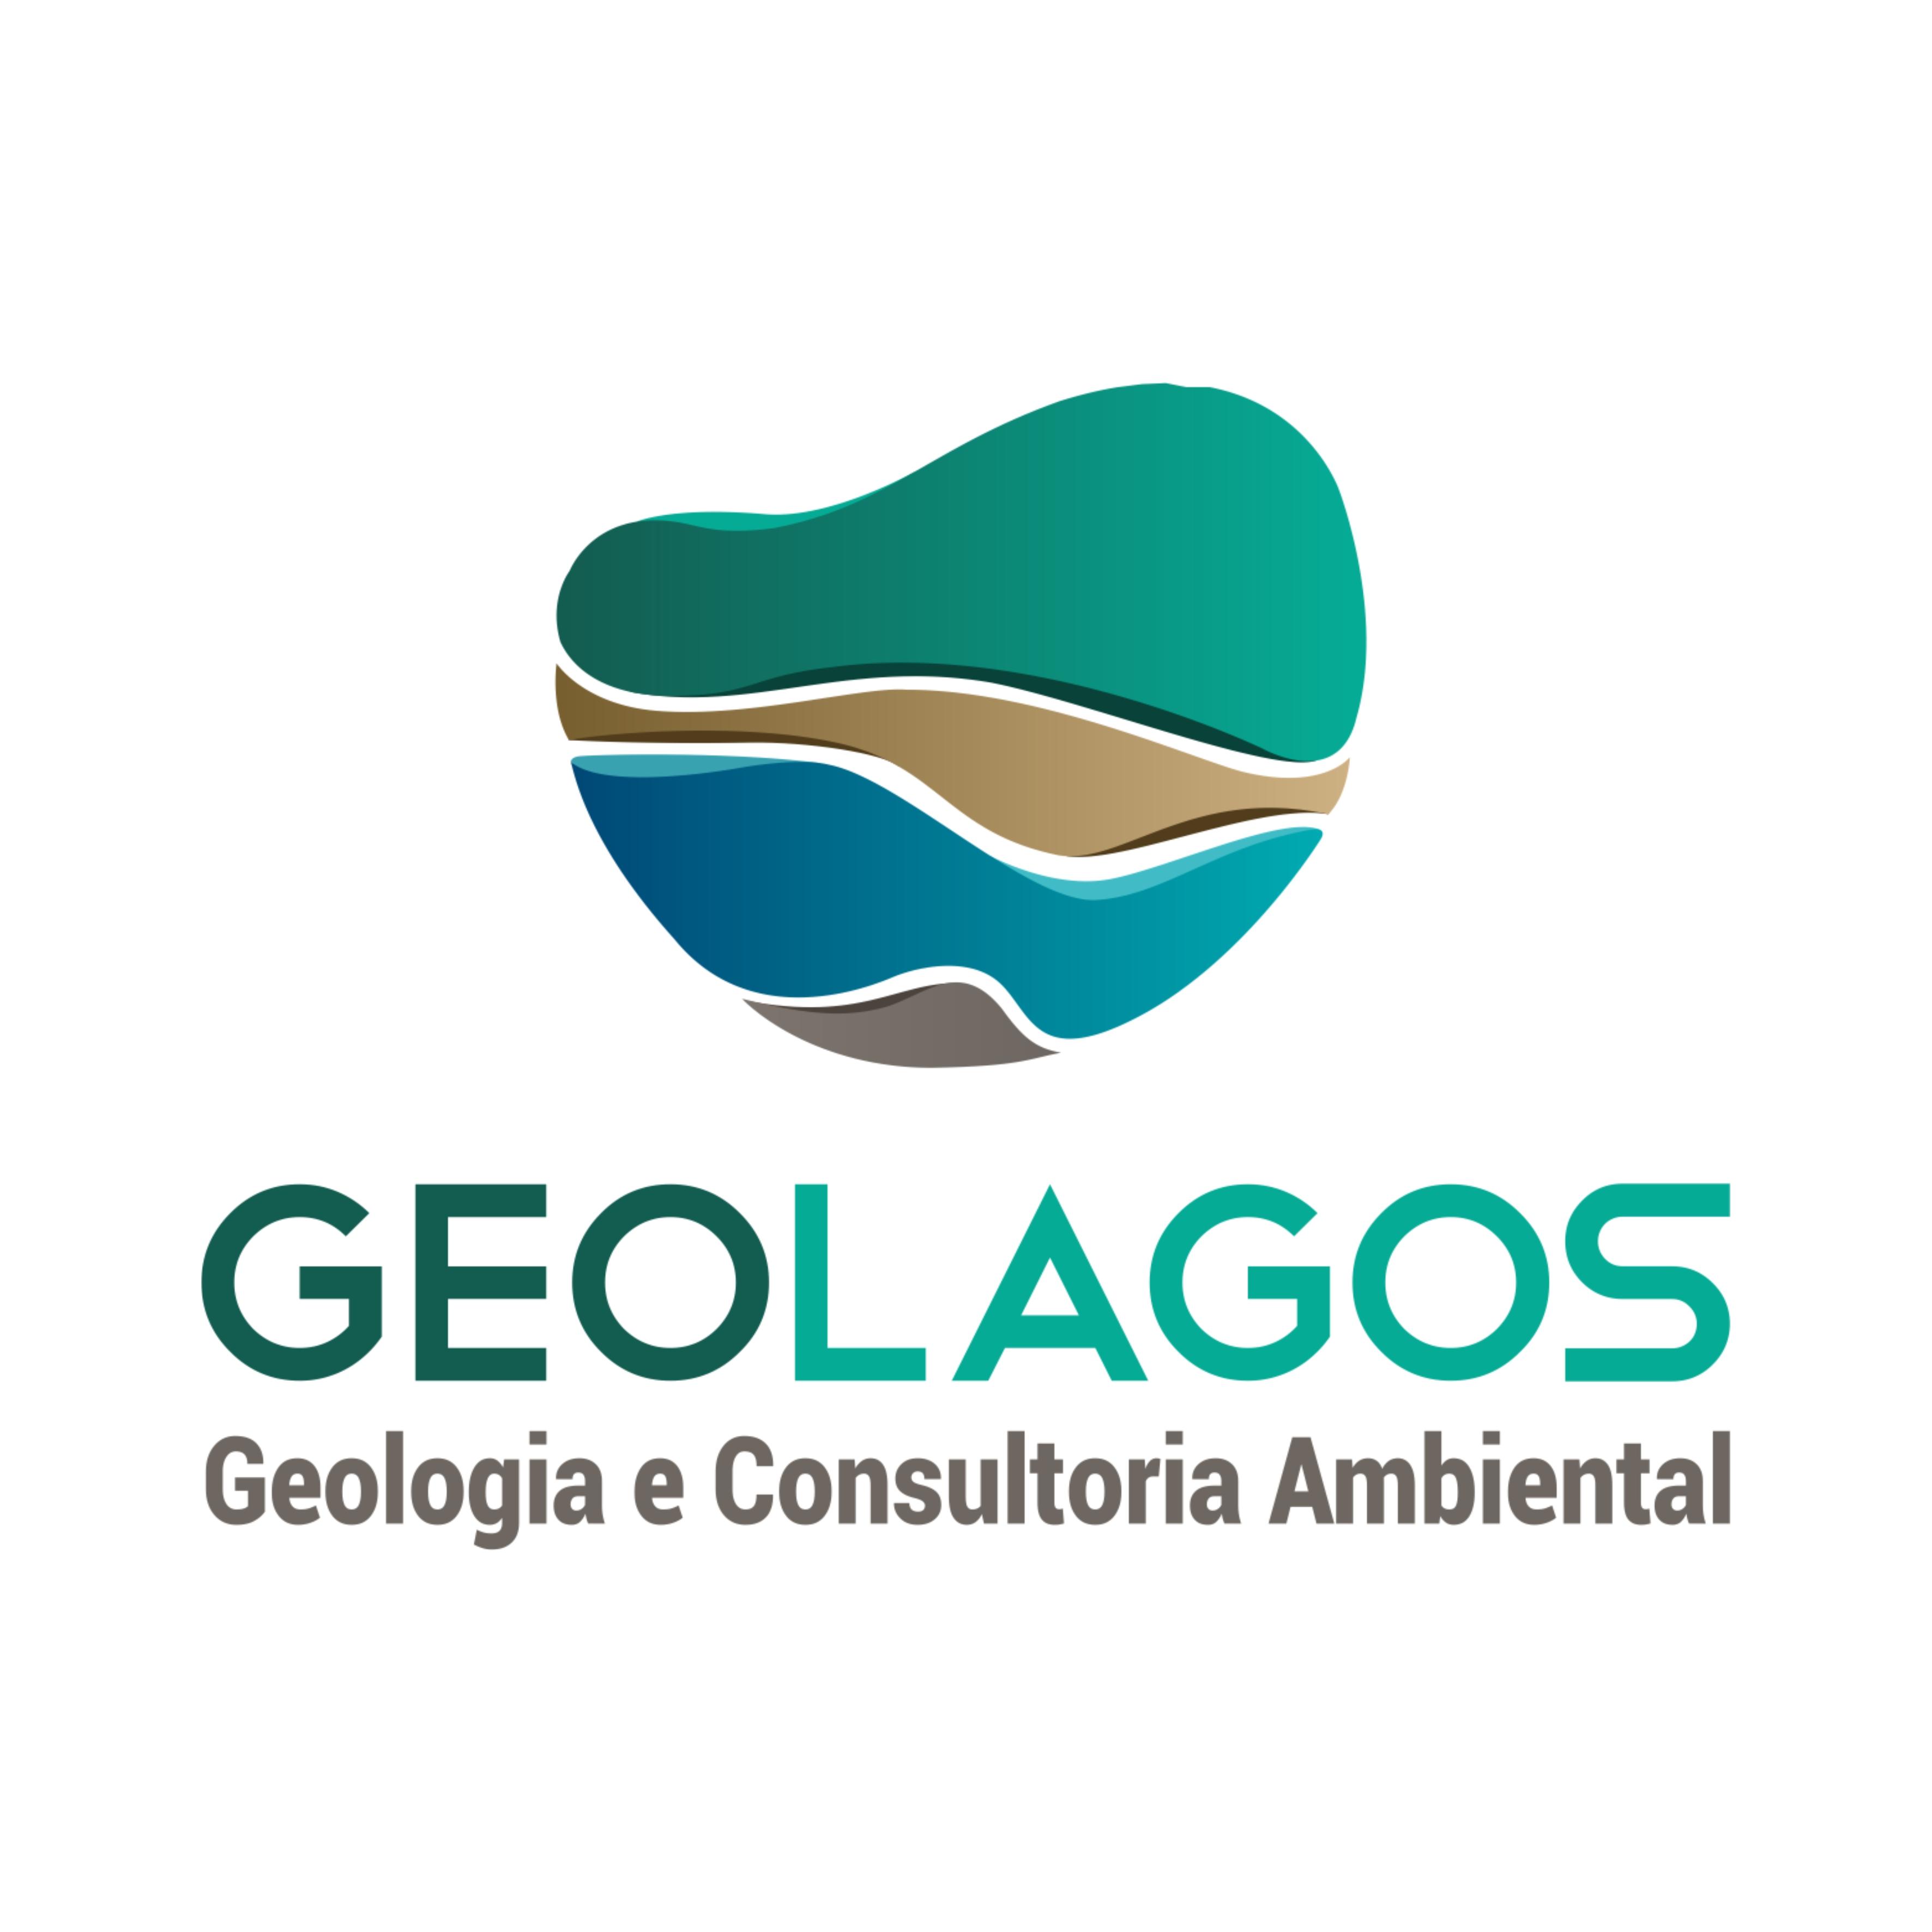 Geolagos